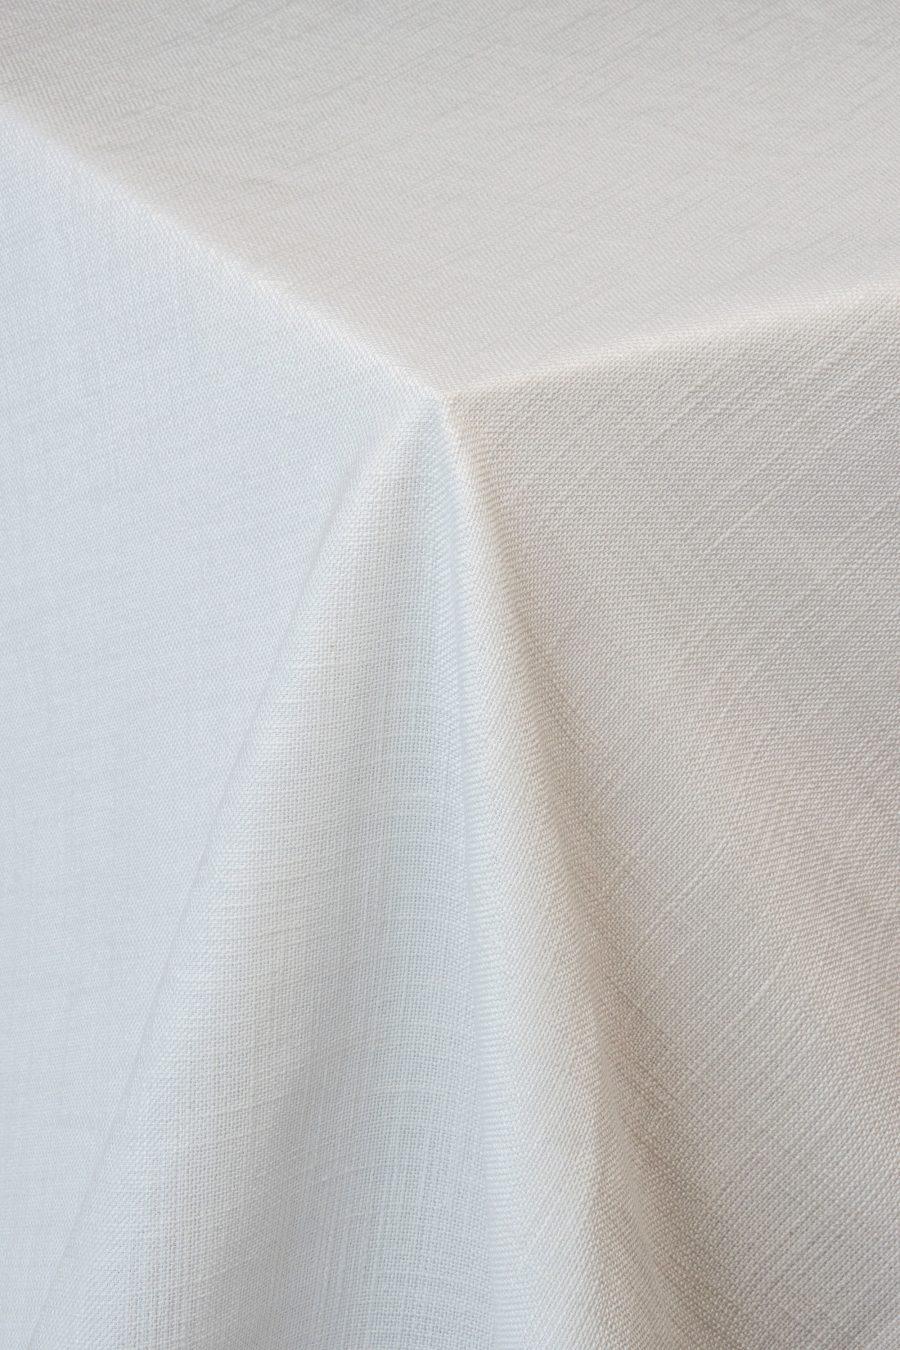 Basic-White-900x1350.jpg